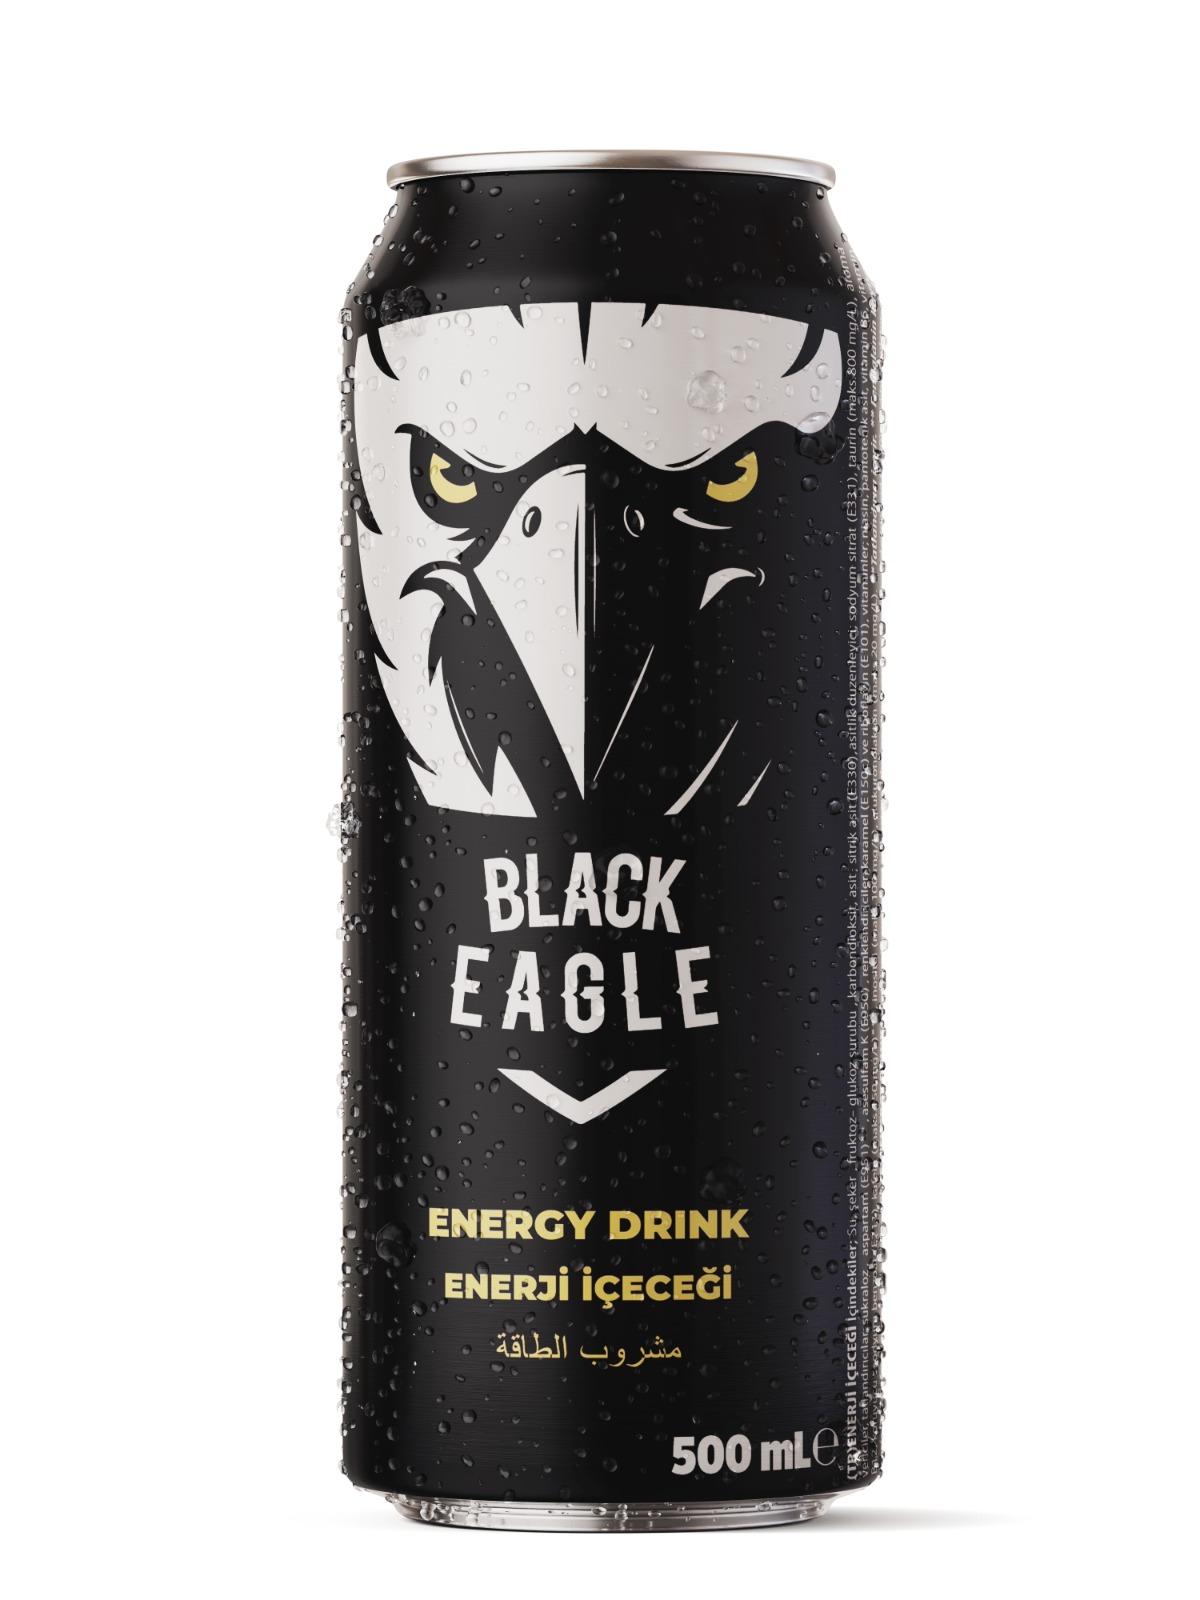 Boisson énergisante Black Eagle